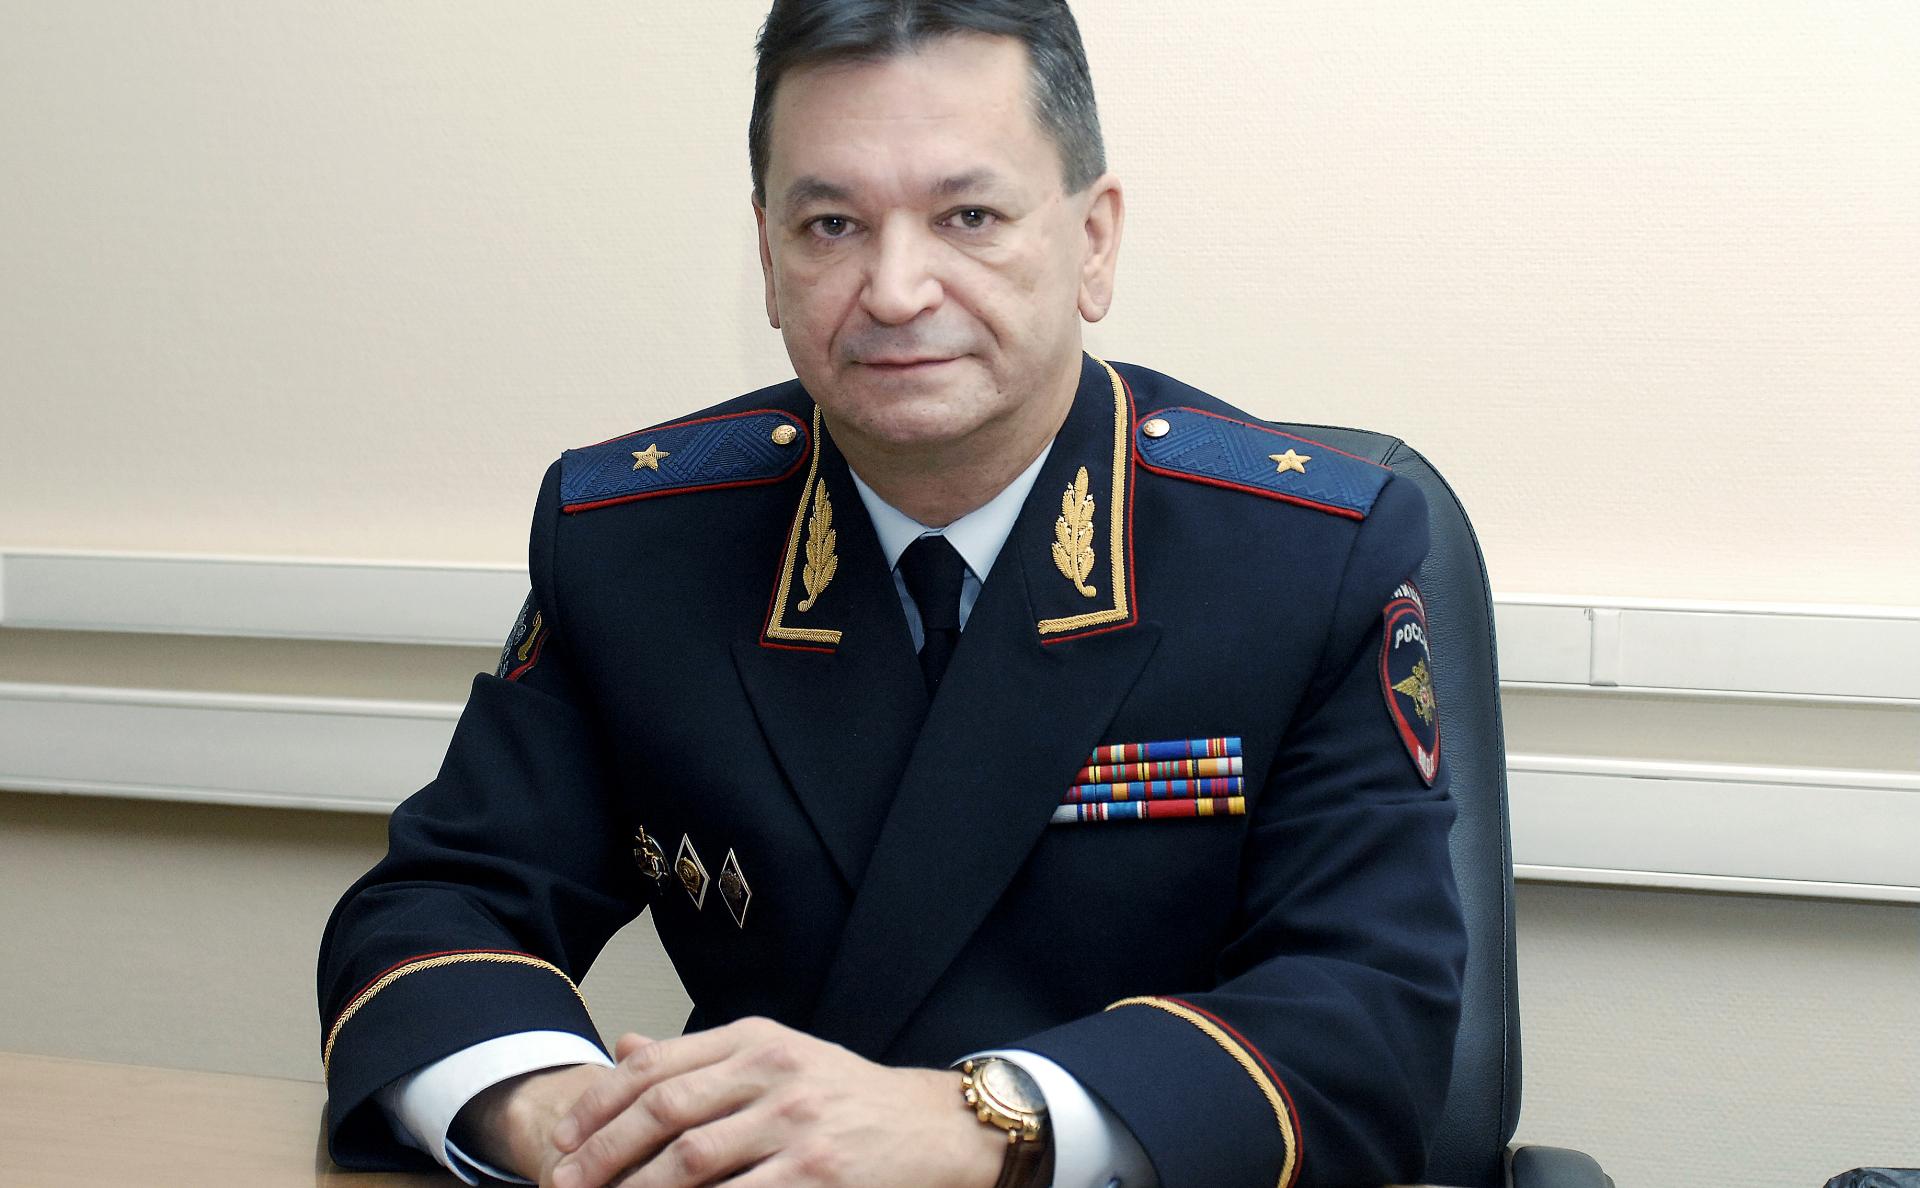 Фото:пресс-служба МВД РФ / ТАСС